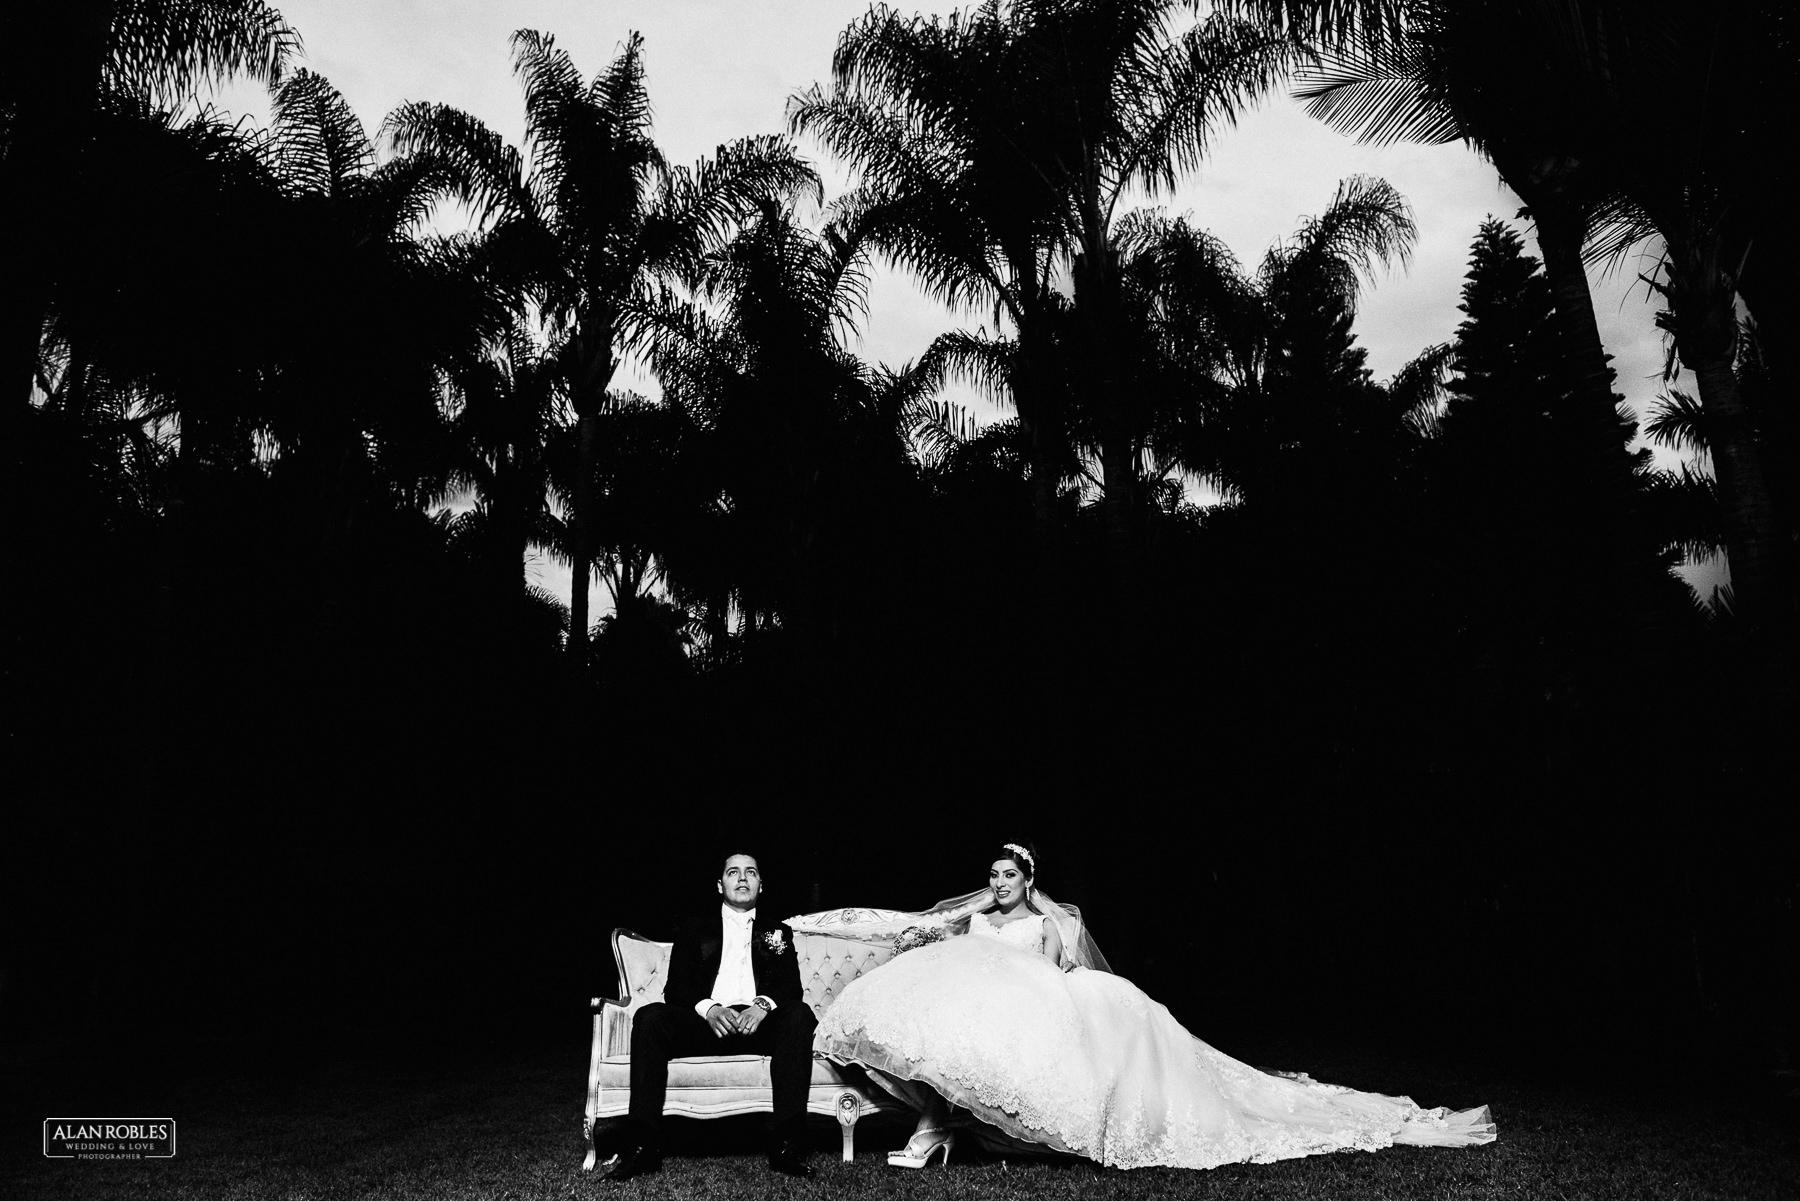 Alan Robles fotografo de bodas guadalajara - LyP Hotel Demetria-60